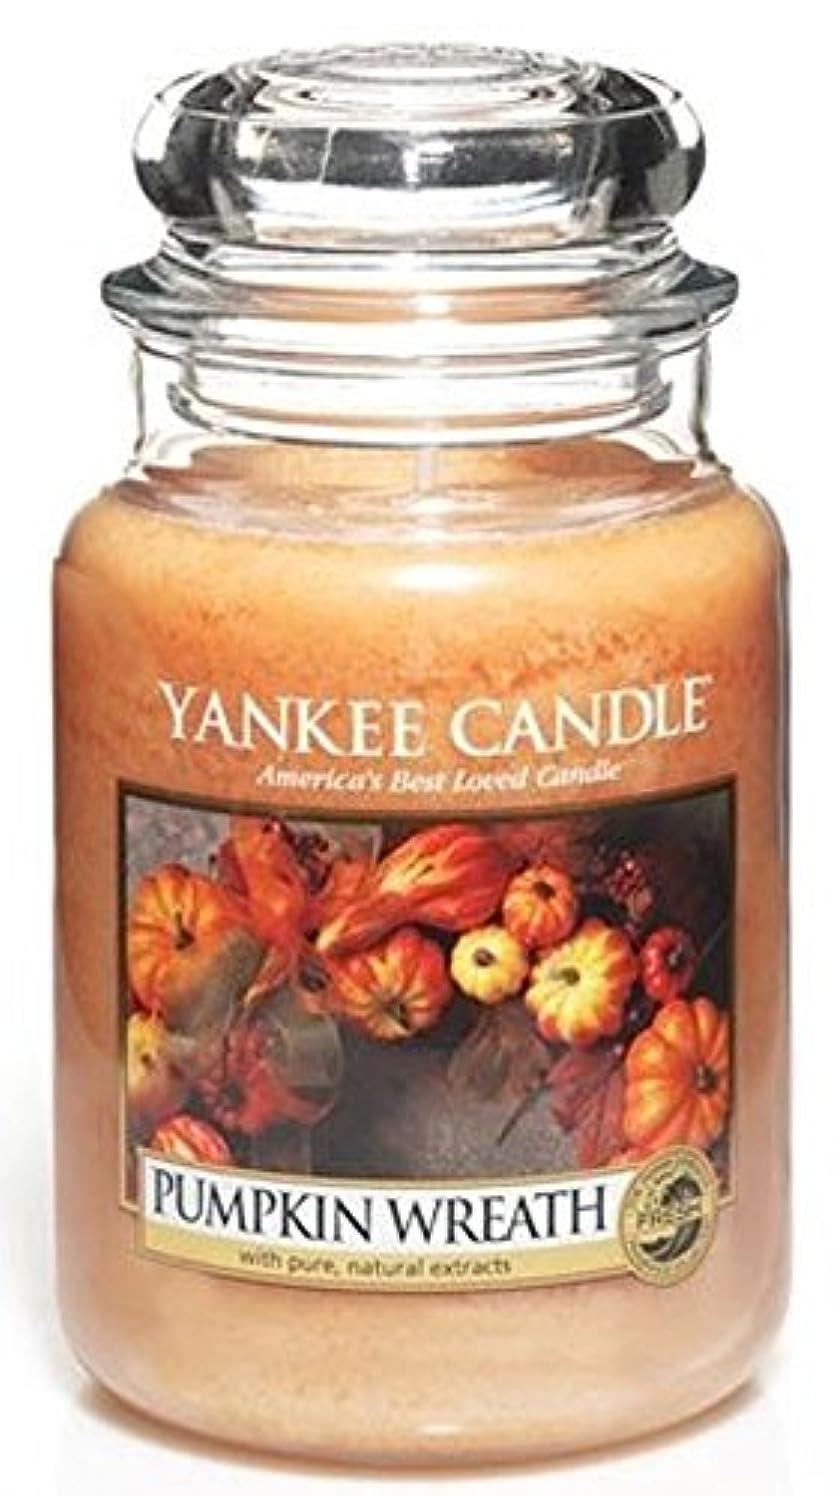 Yankee Candle Pumpkin Wreath Large Jar Candle、新鮮な香り